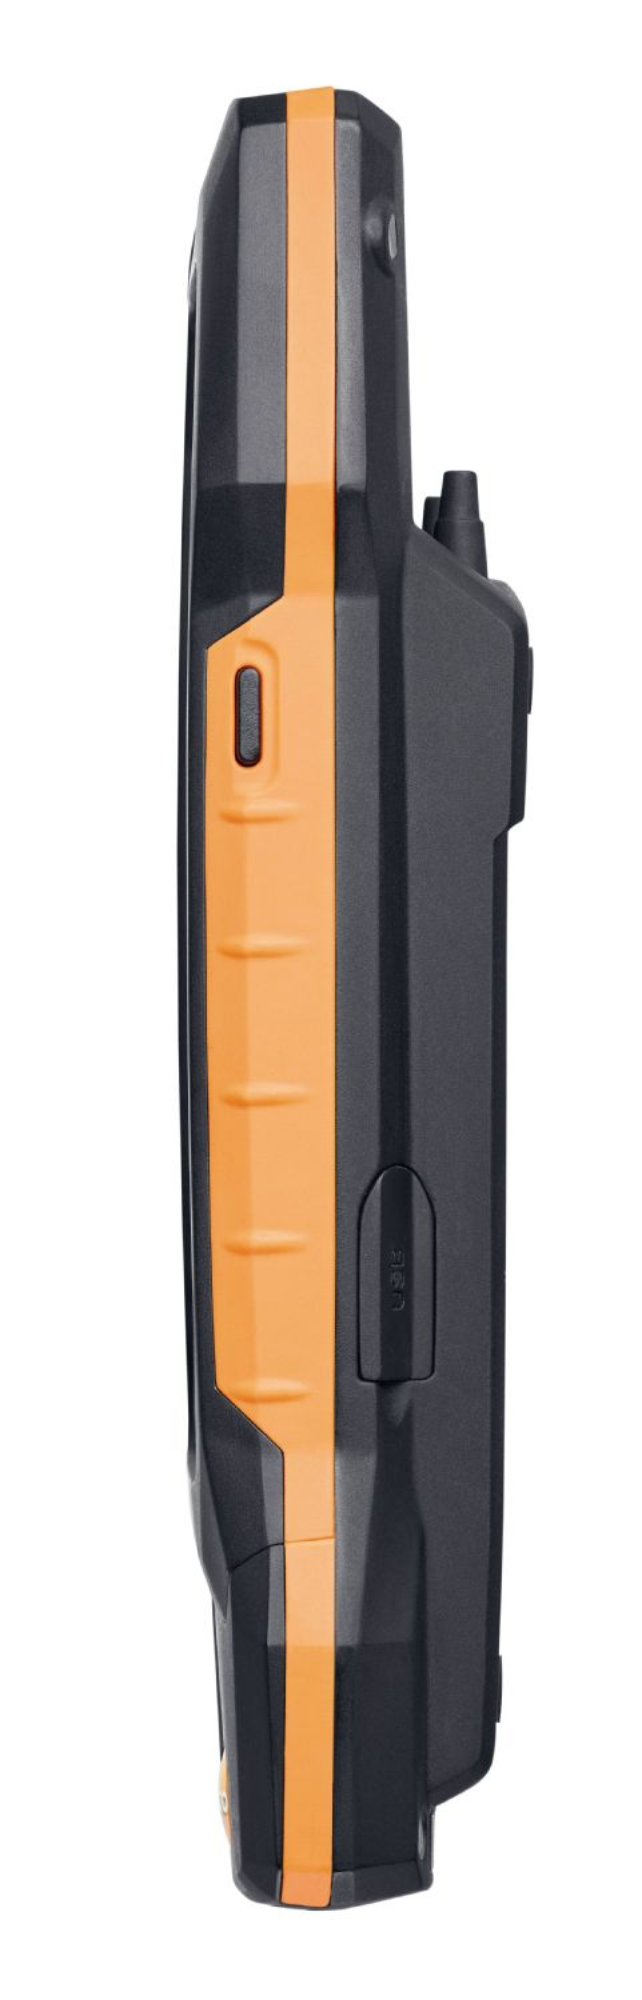 testo 400 Universal IAQ instrument